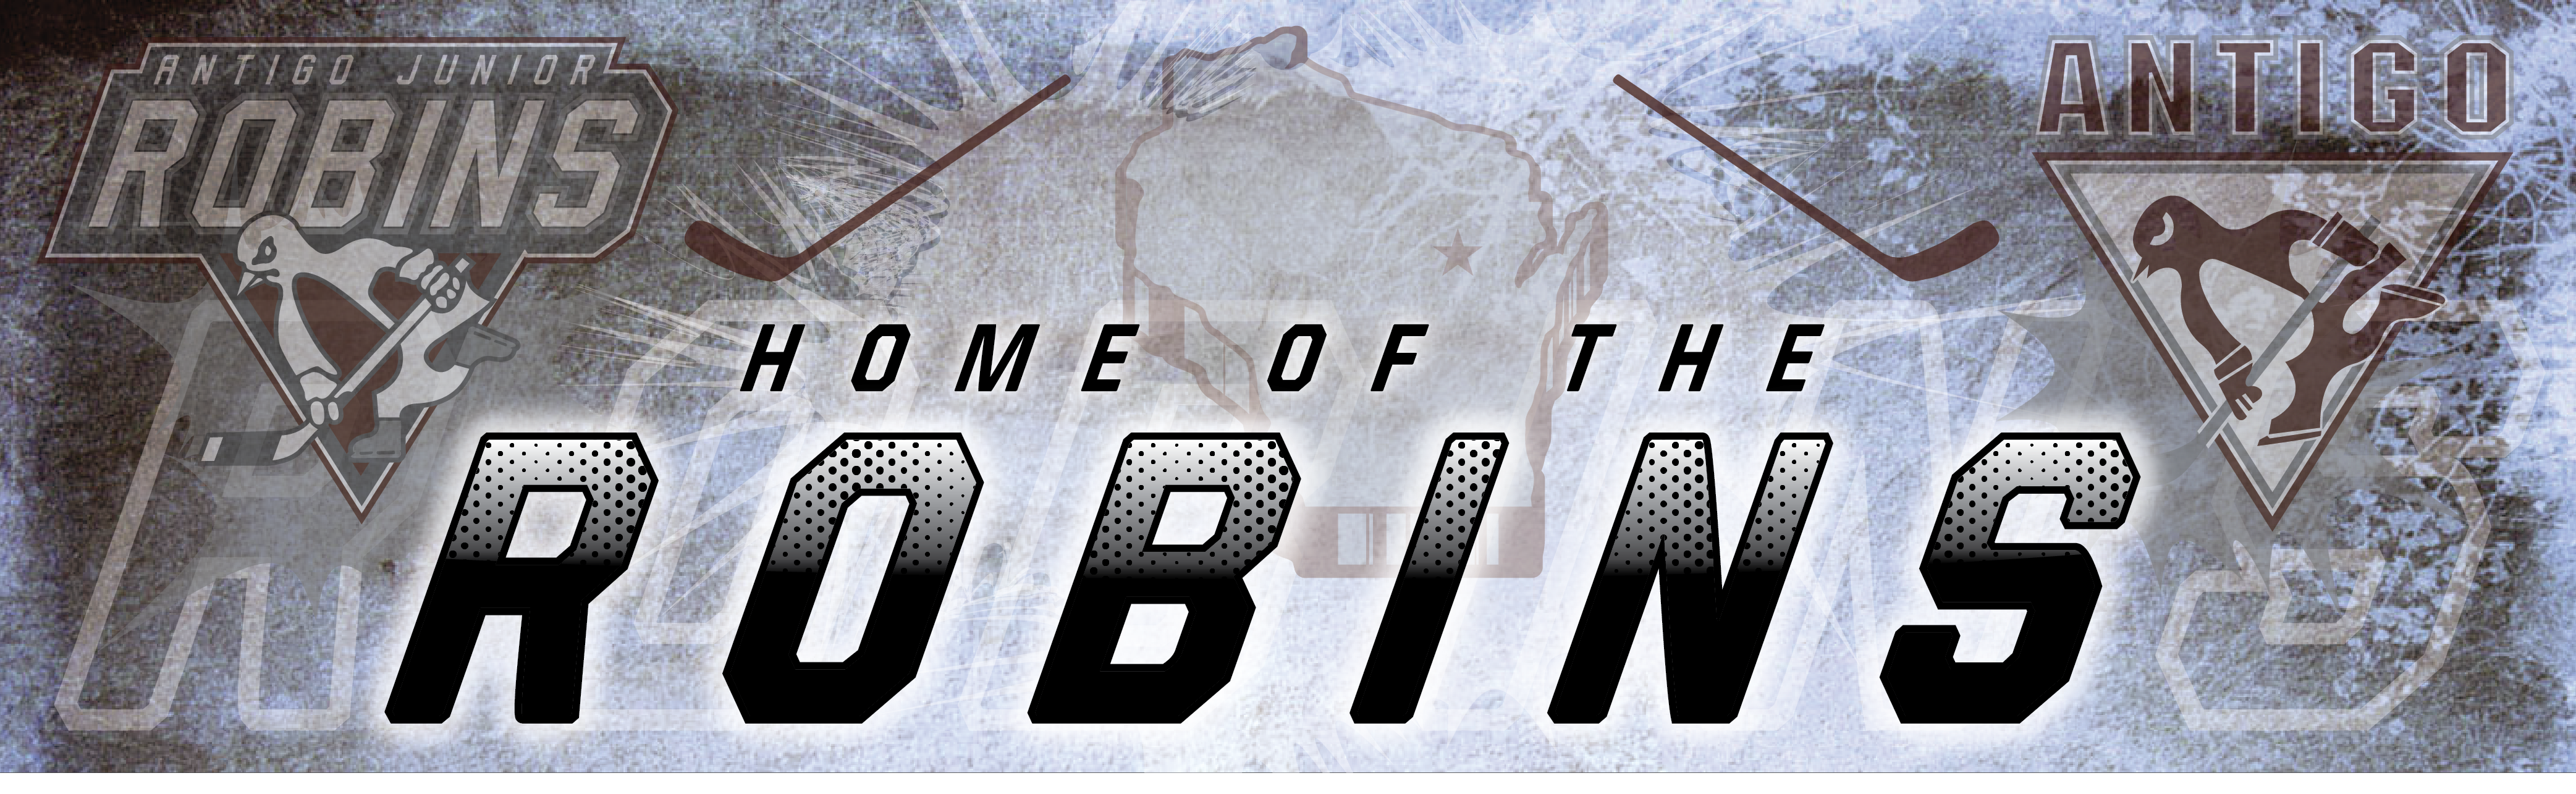 Robin website banner 2